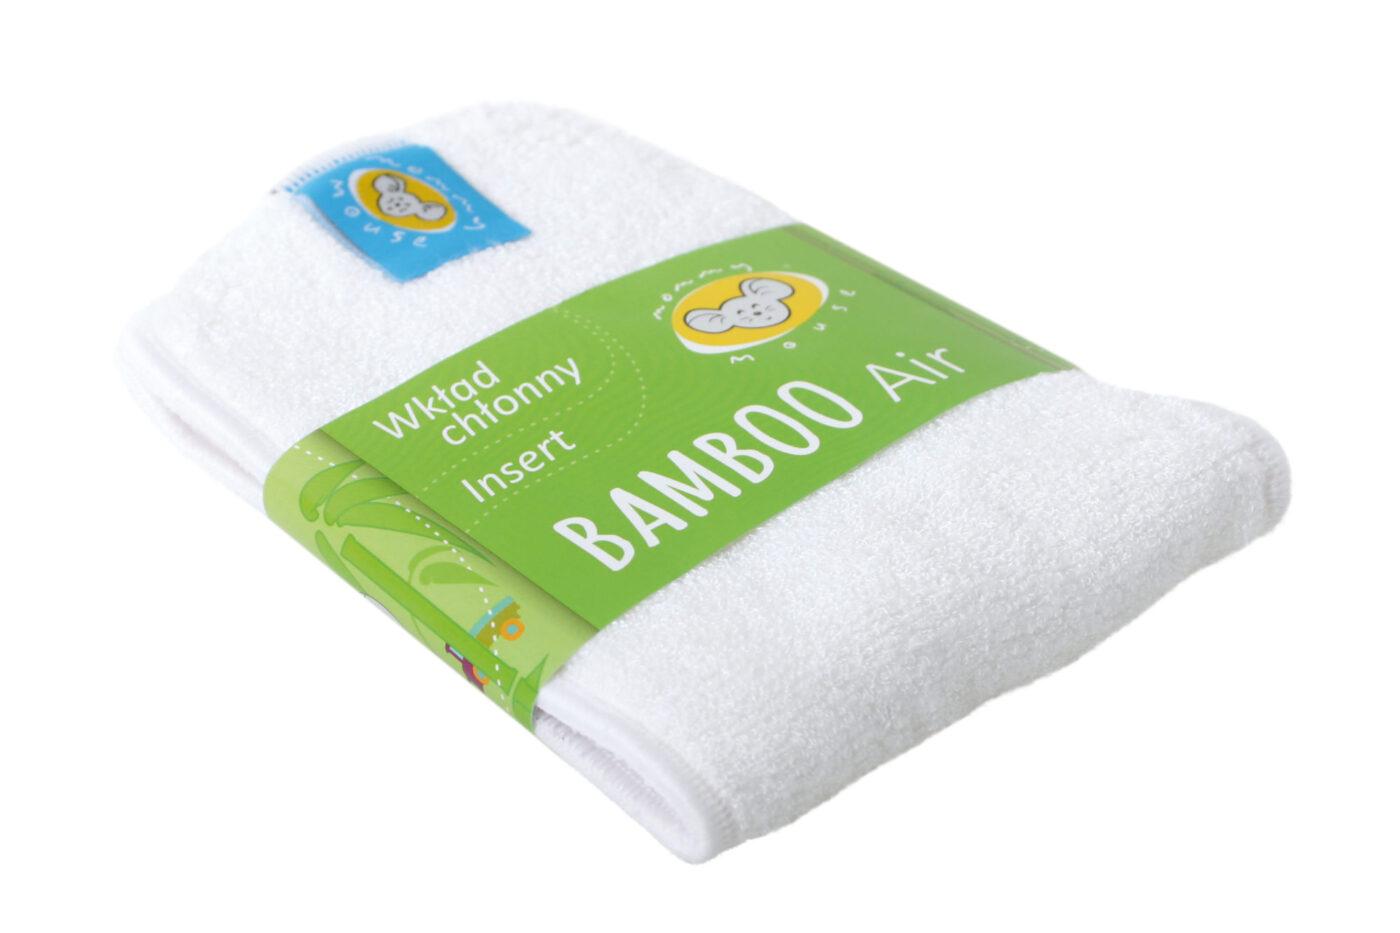 wklad bamboo air 2 obwoluta 1400x933 - Bamboo – Air